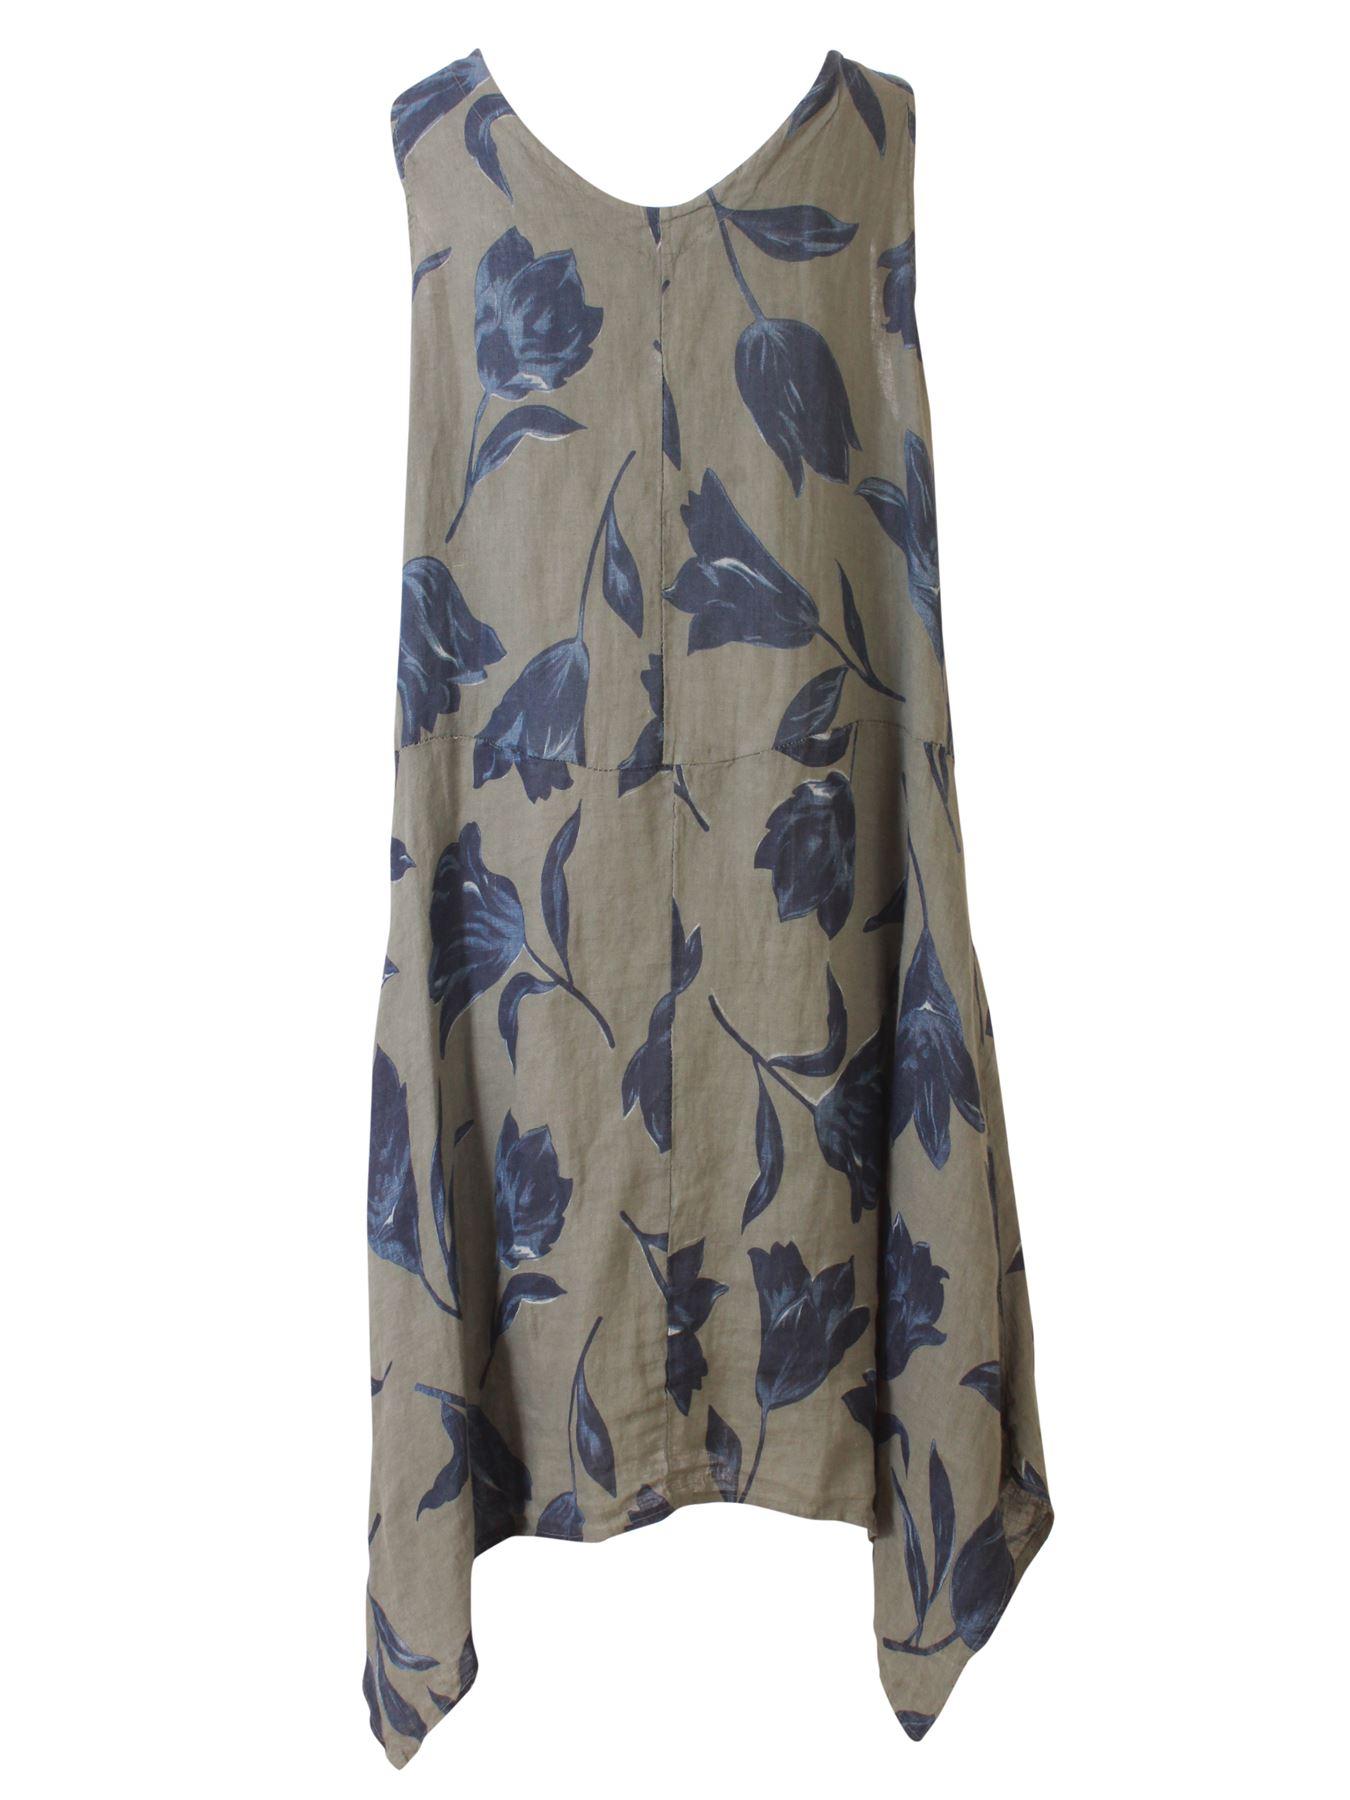 Womens-Tulip-Floral-Print-Italian-Lagenlook-Ladies-Linen-Dress-Two-Button-V-Neck thumbnail 11